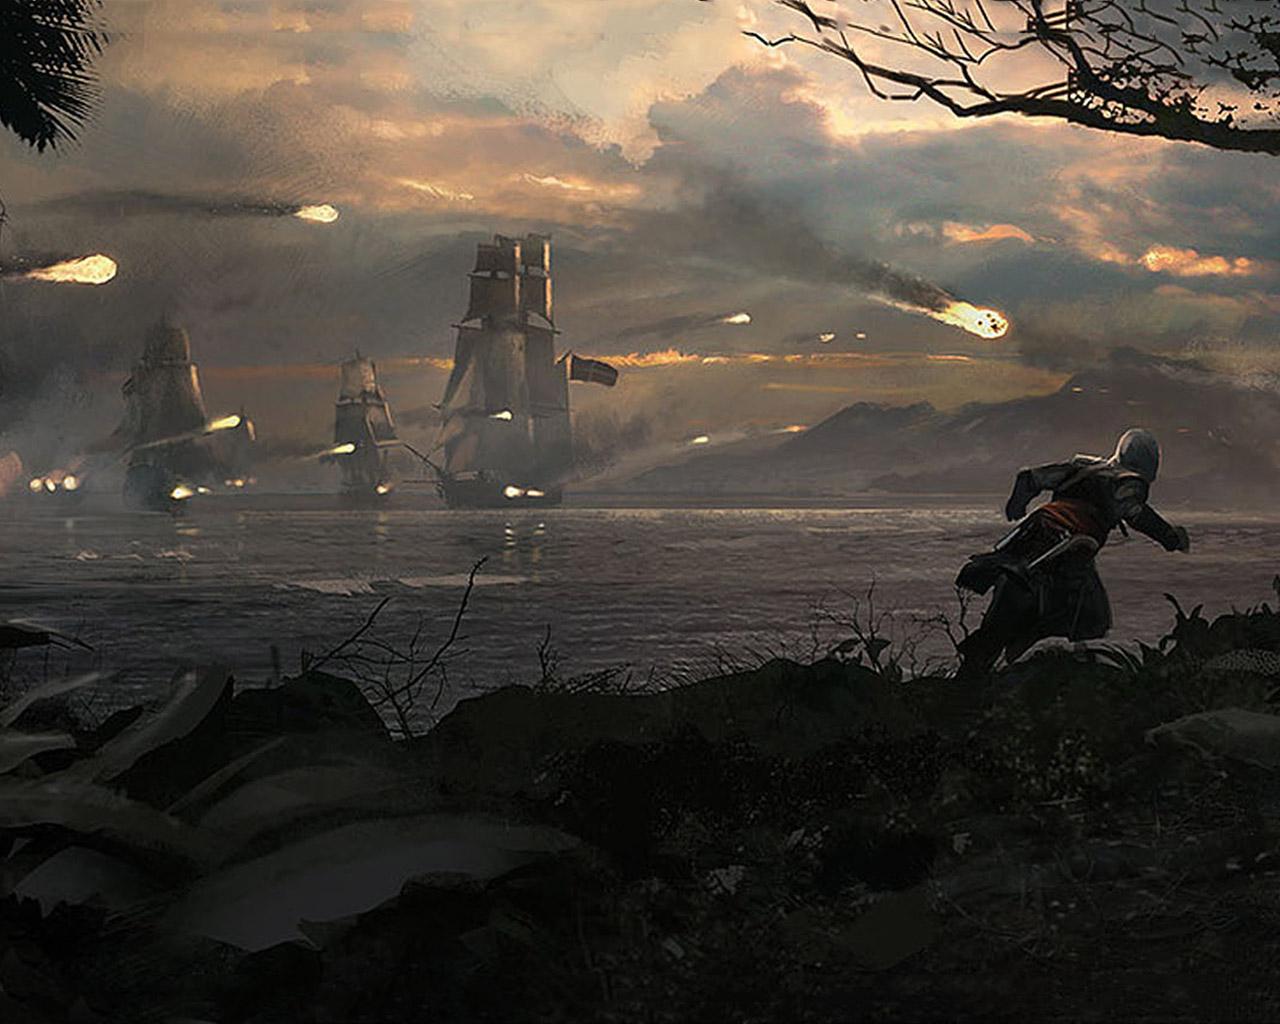 Assassin's Creed IV: Black Flag Wallpaper in 1280x1024